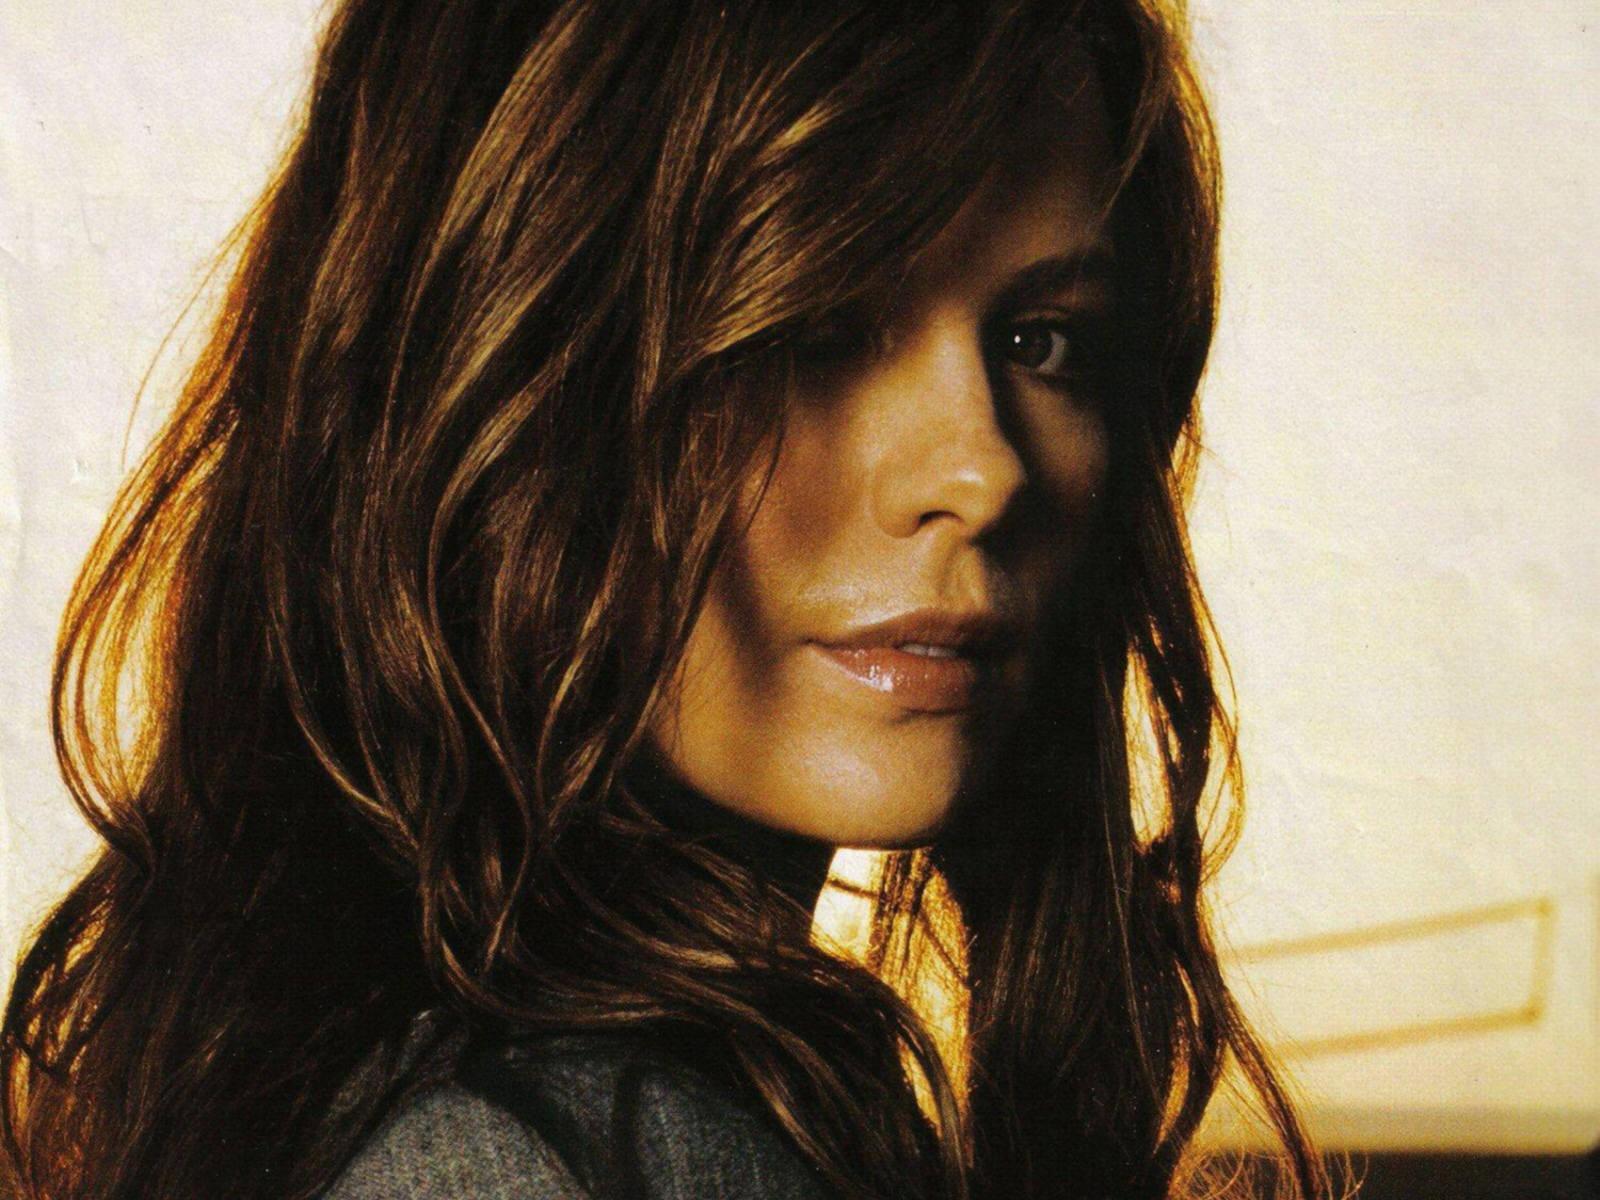 Wallpaper di Kate Beckinsale - 39